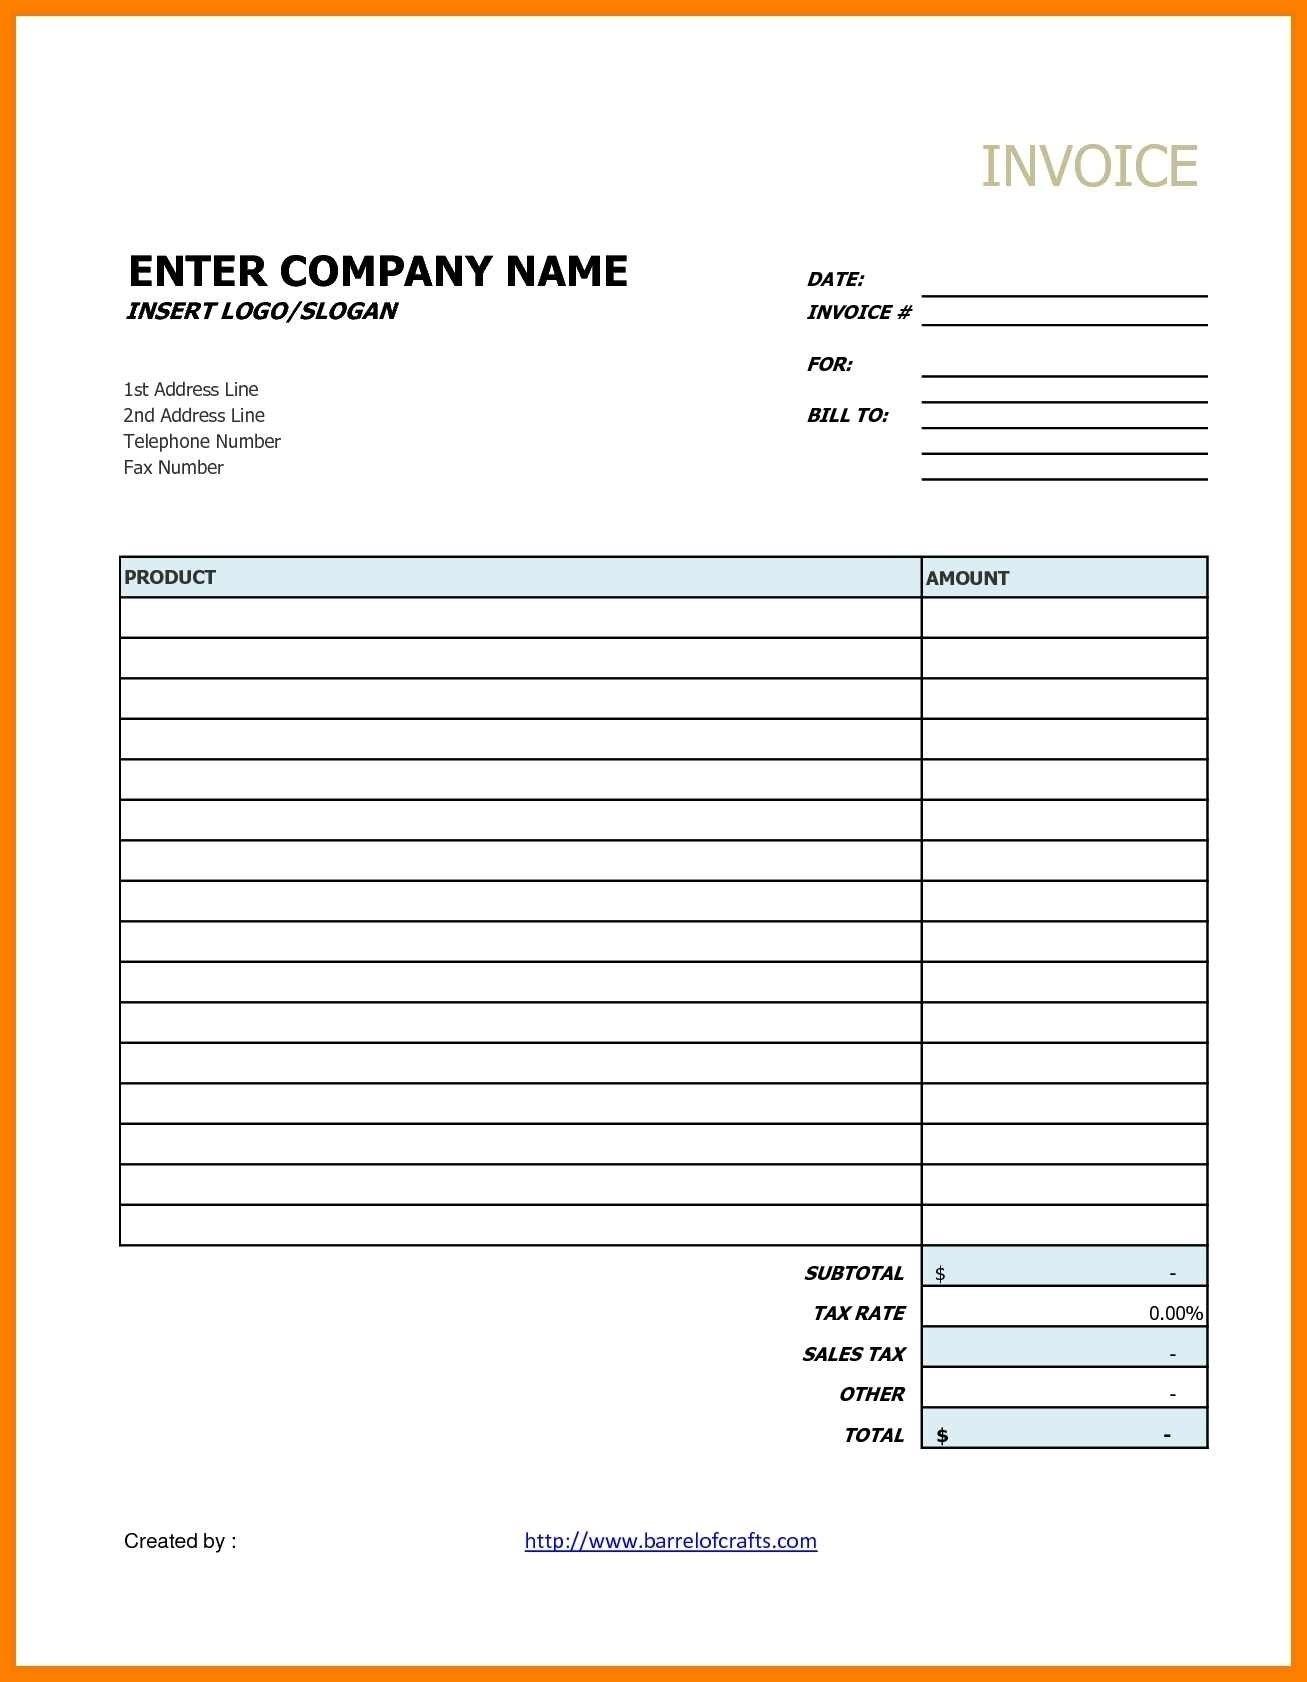 Invoice Template Google Drive Ideas Contractor Docs Best Intended For Google Drive Invoice Template